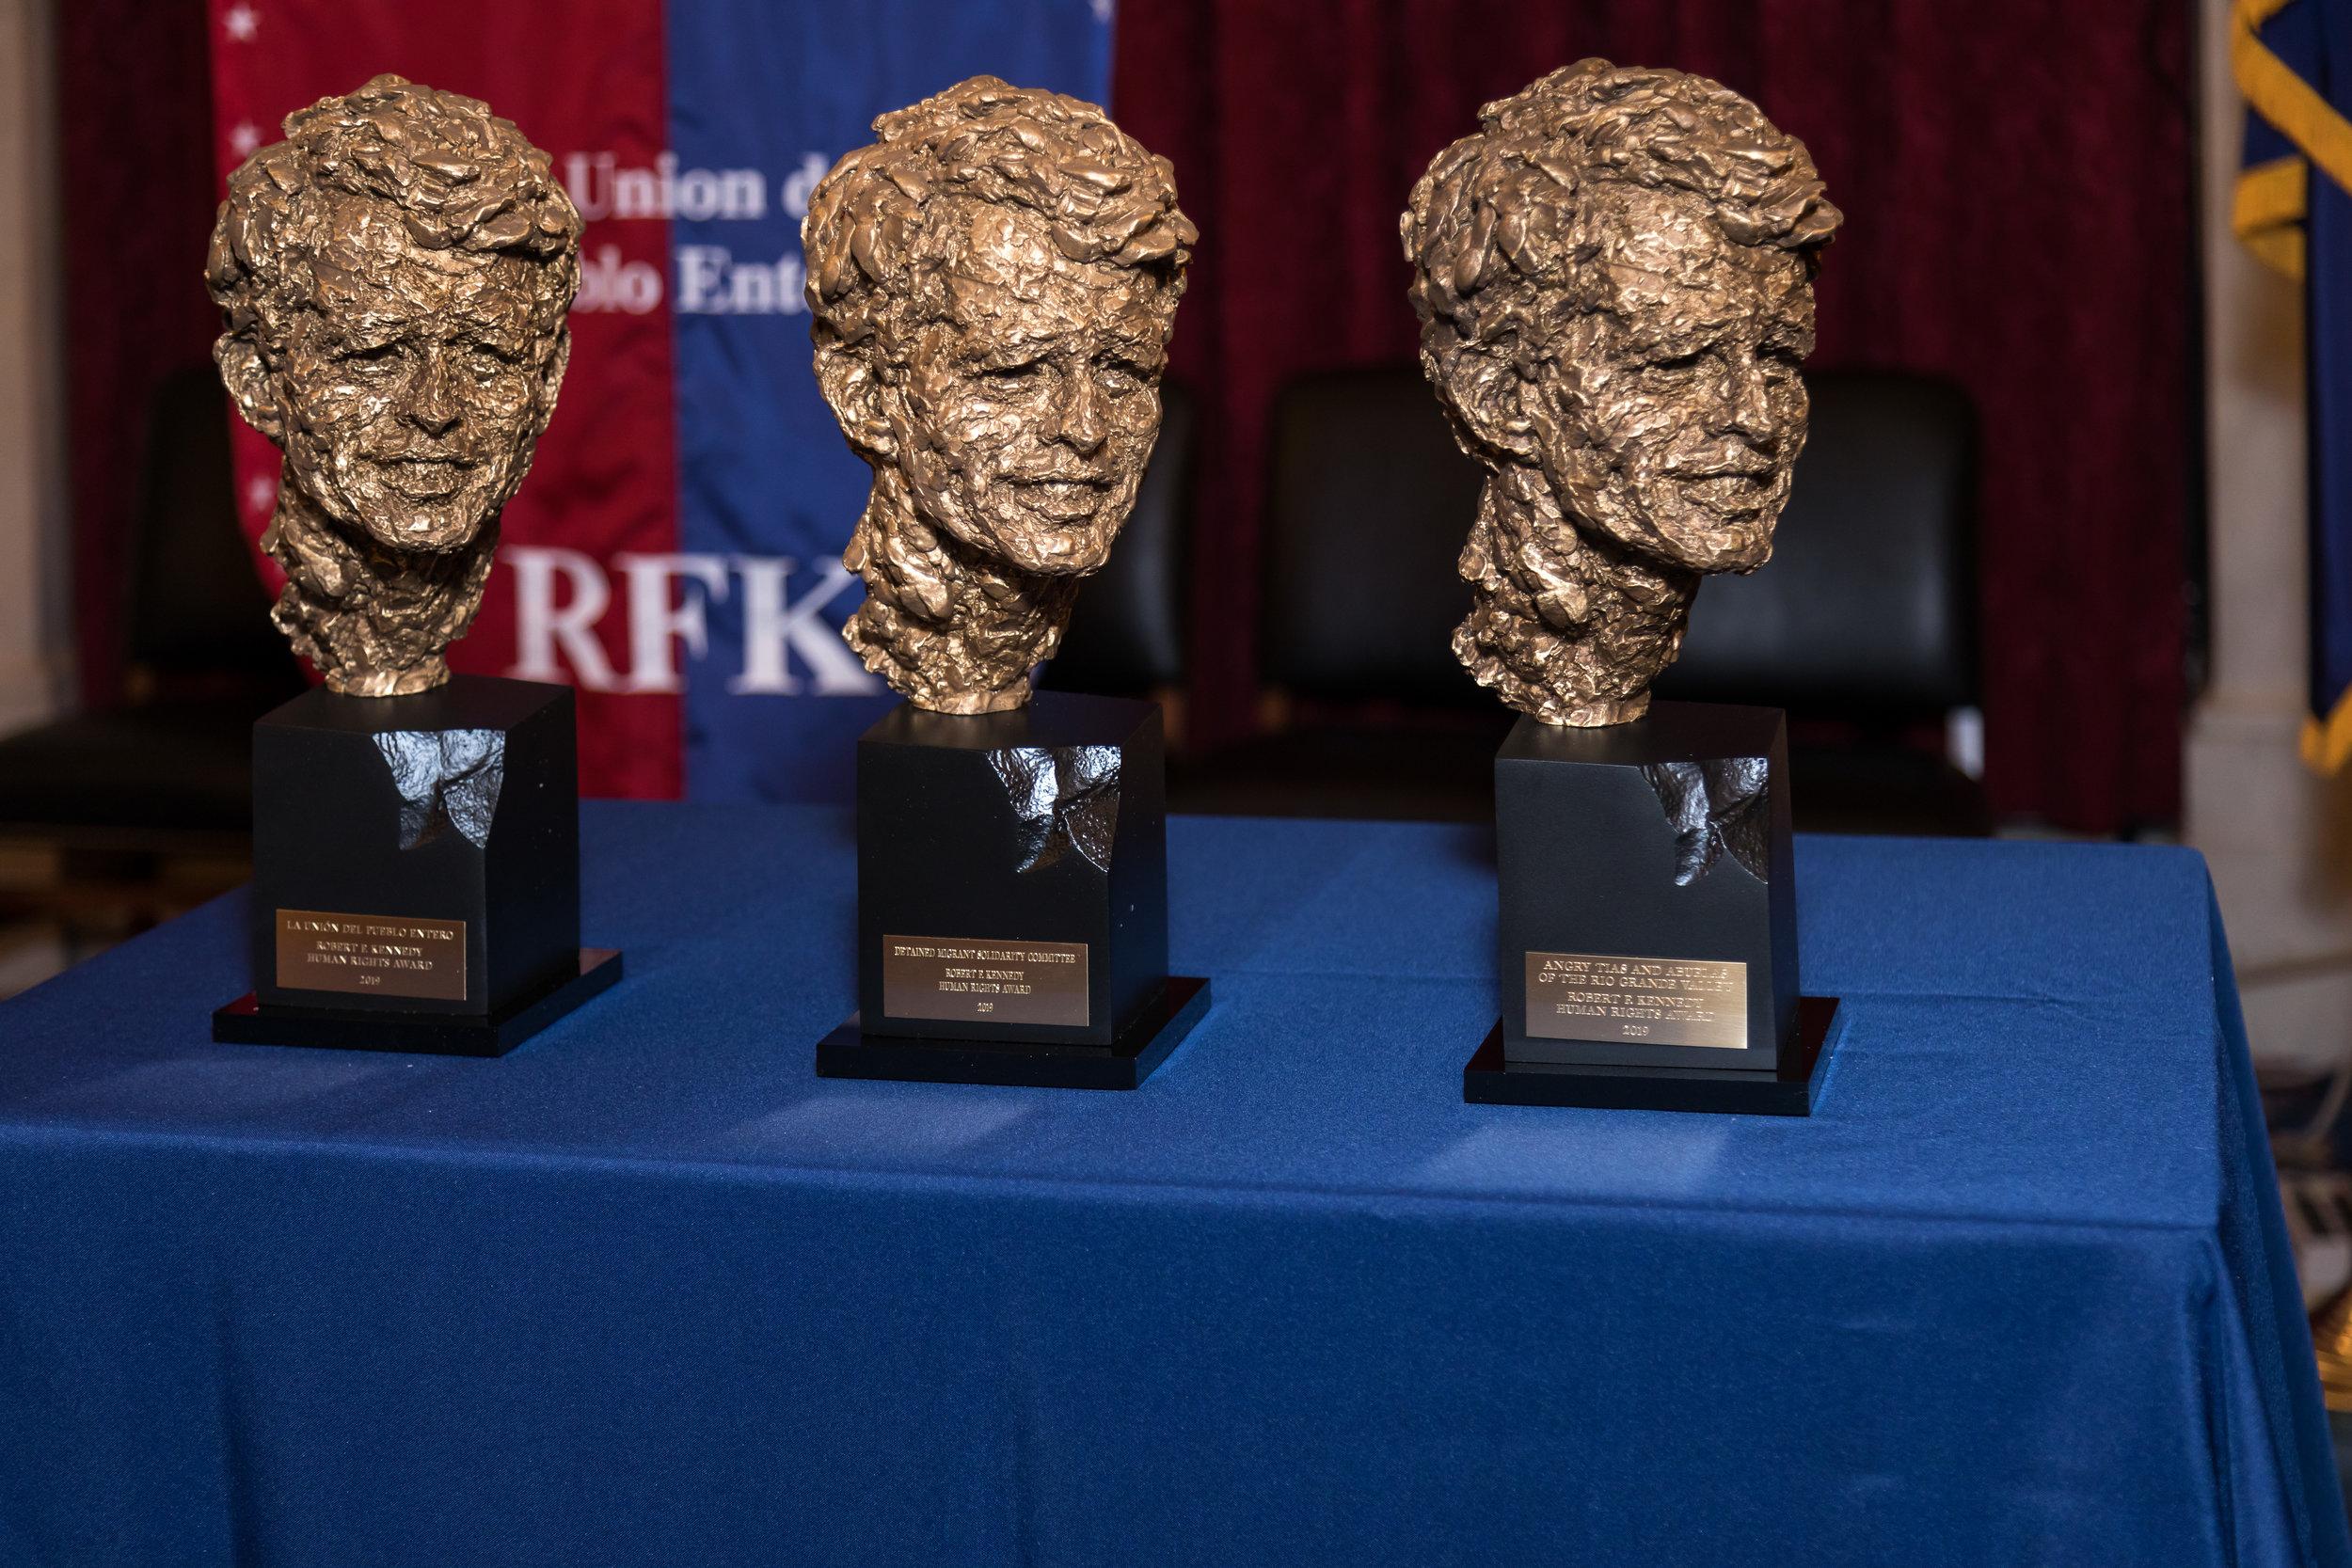 RFK - 2019 - Human Rights Awards-3.jpg